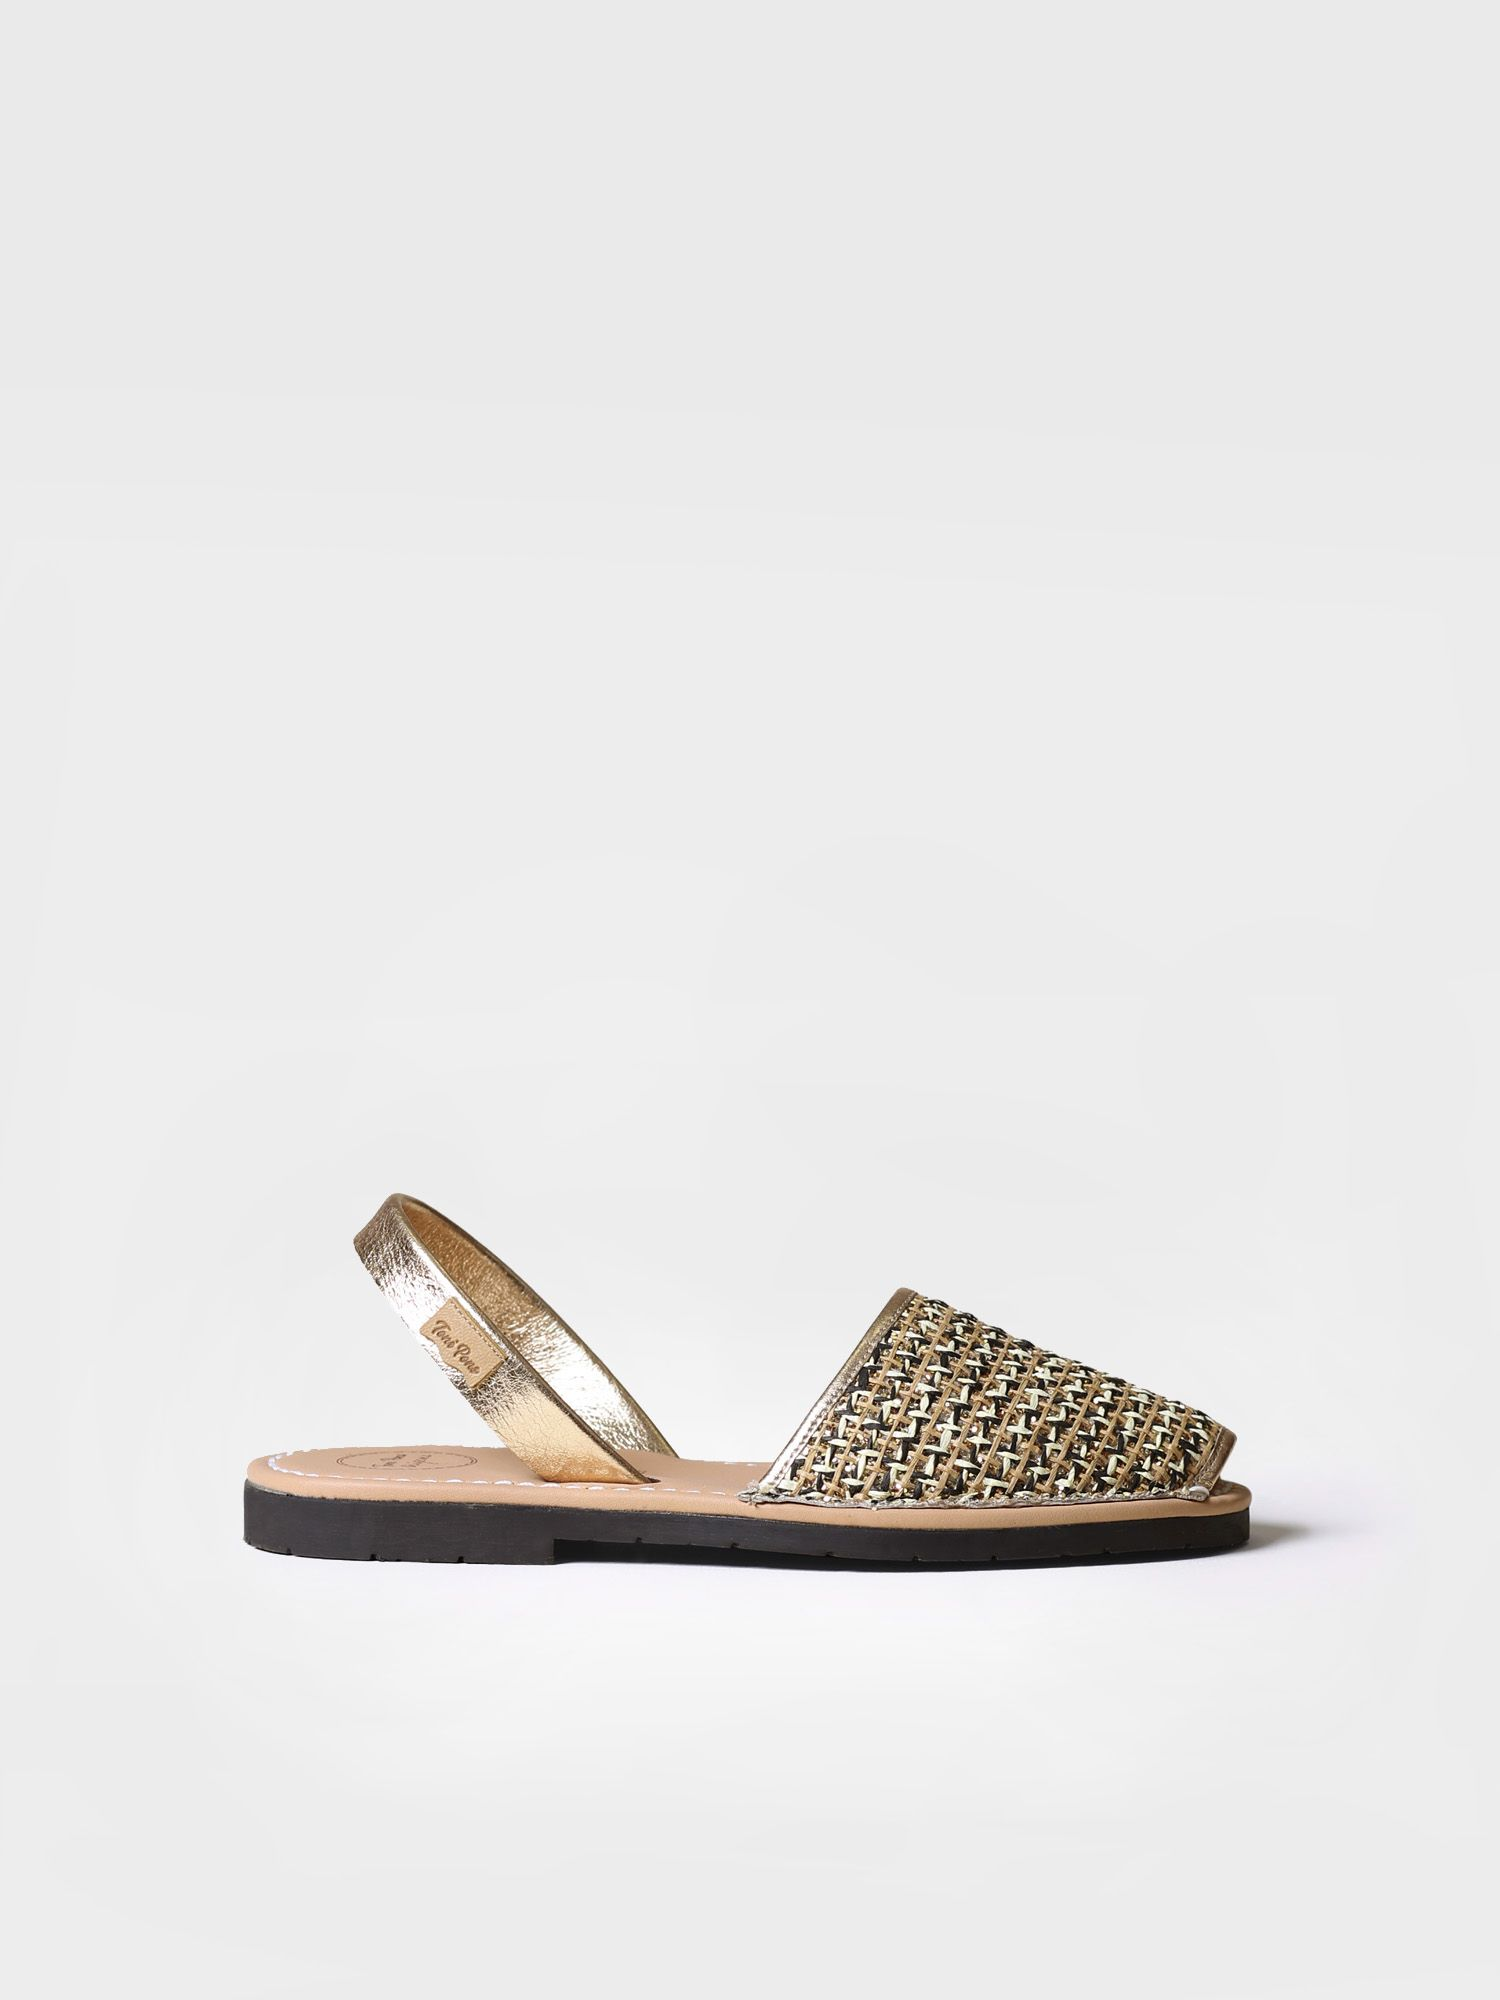 Leather avarca sandal - MAO-PA